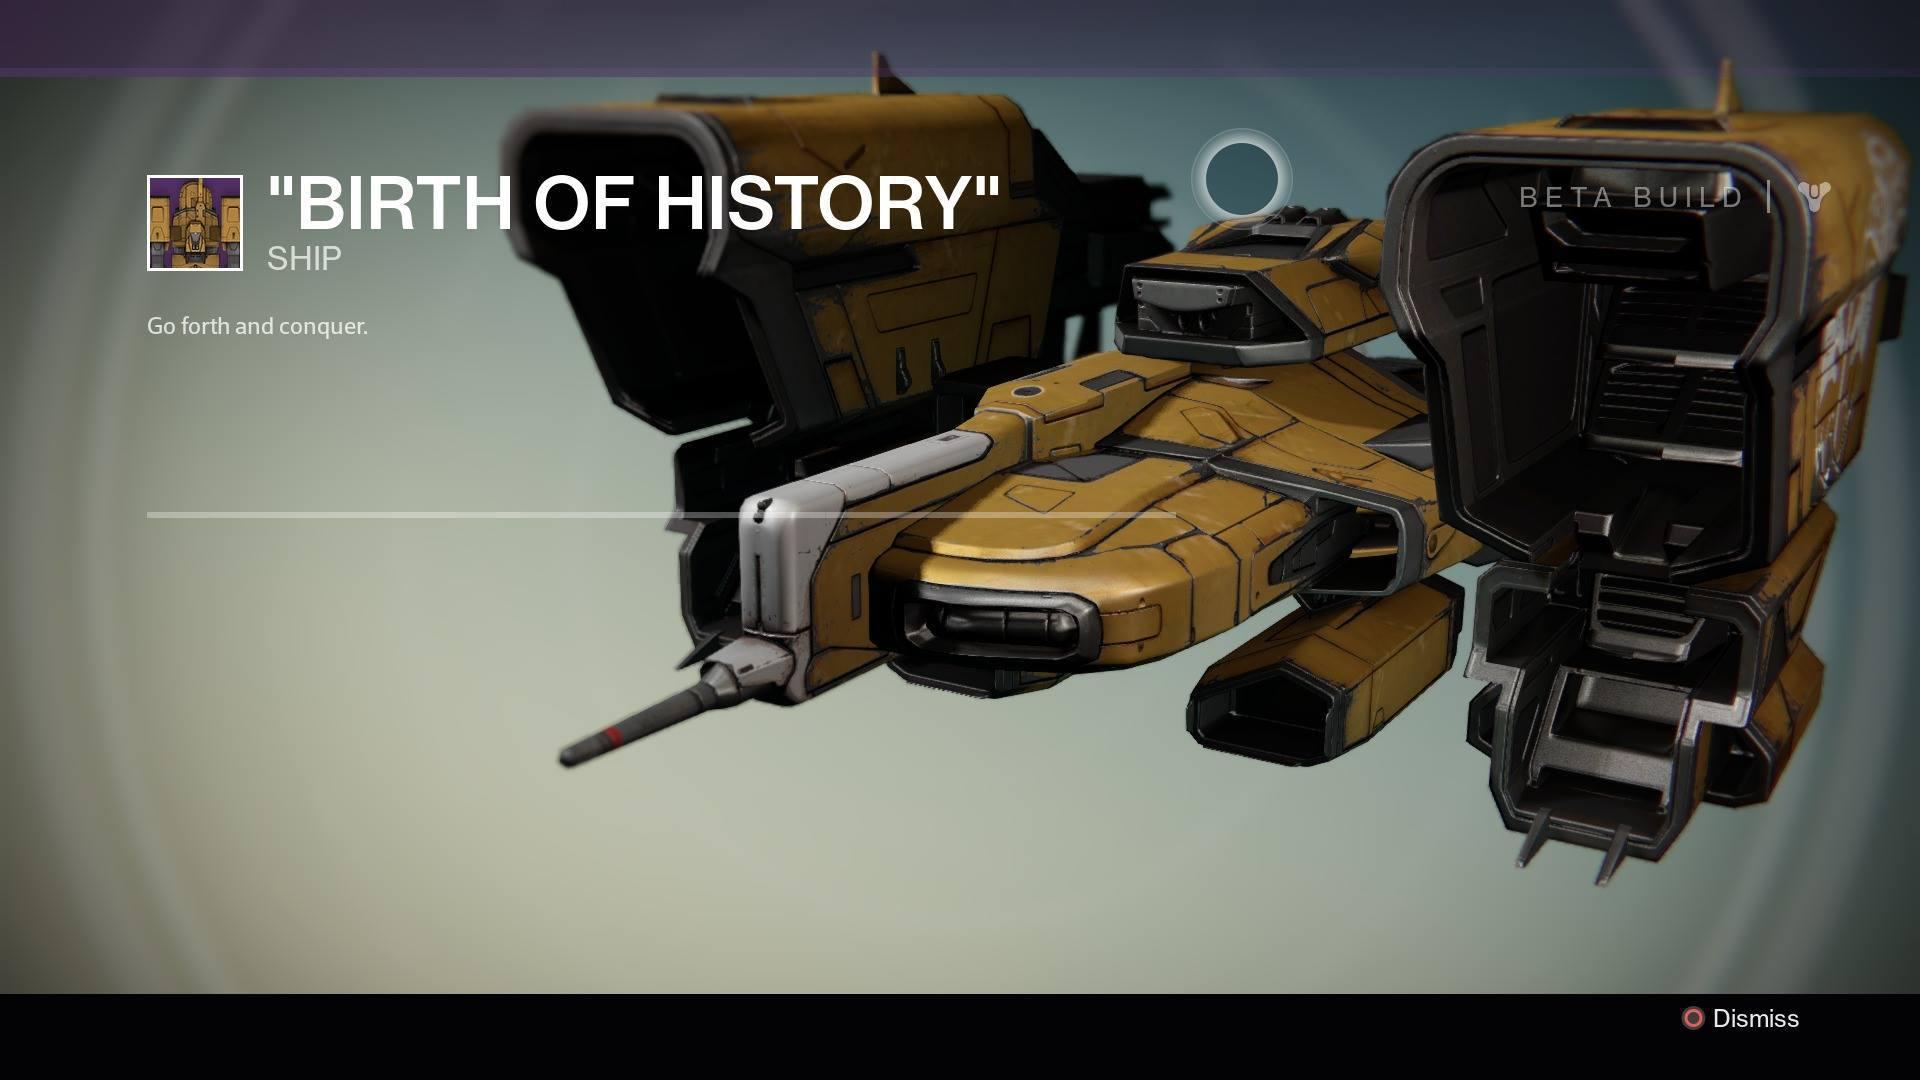 Destiny Iron Banner Armor Destiny Newsnet 1920x1080